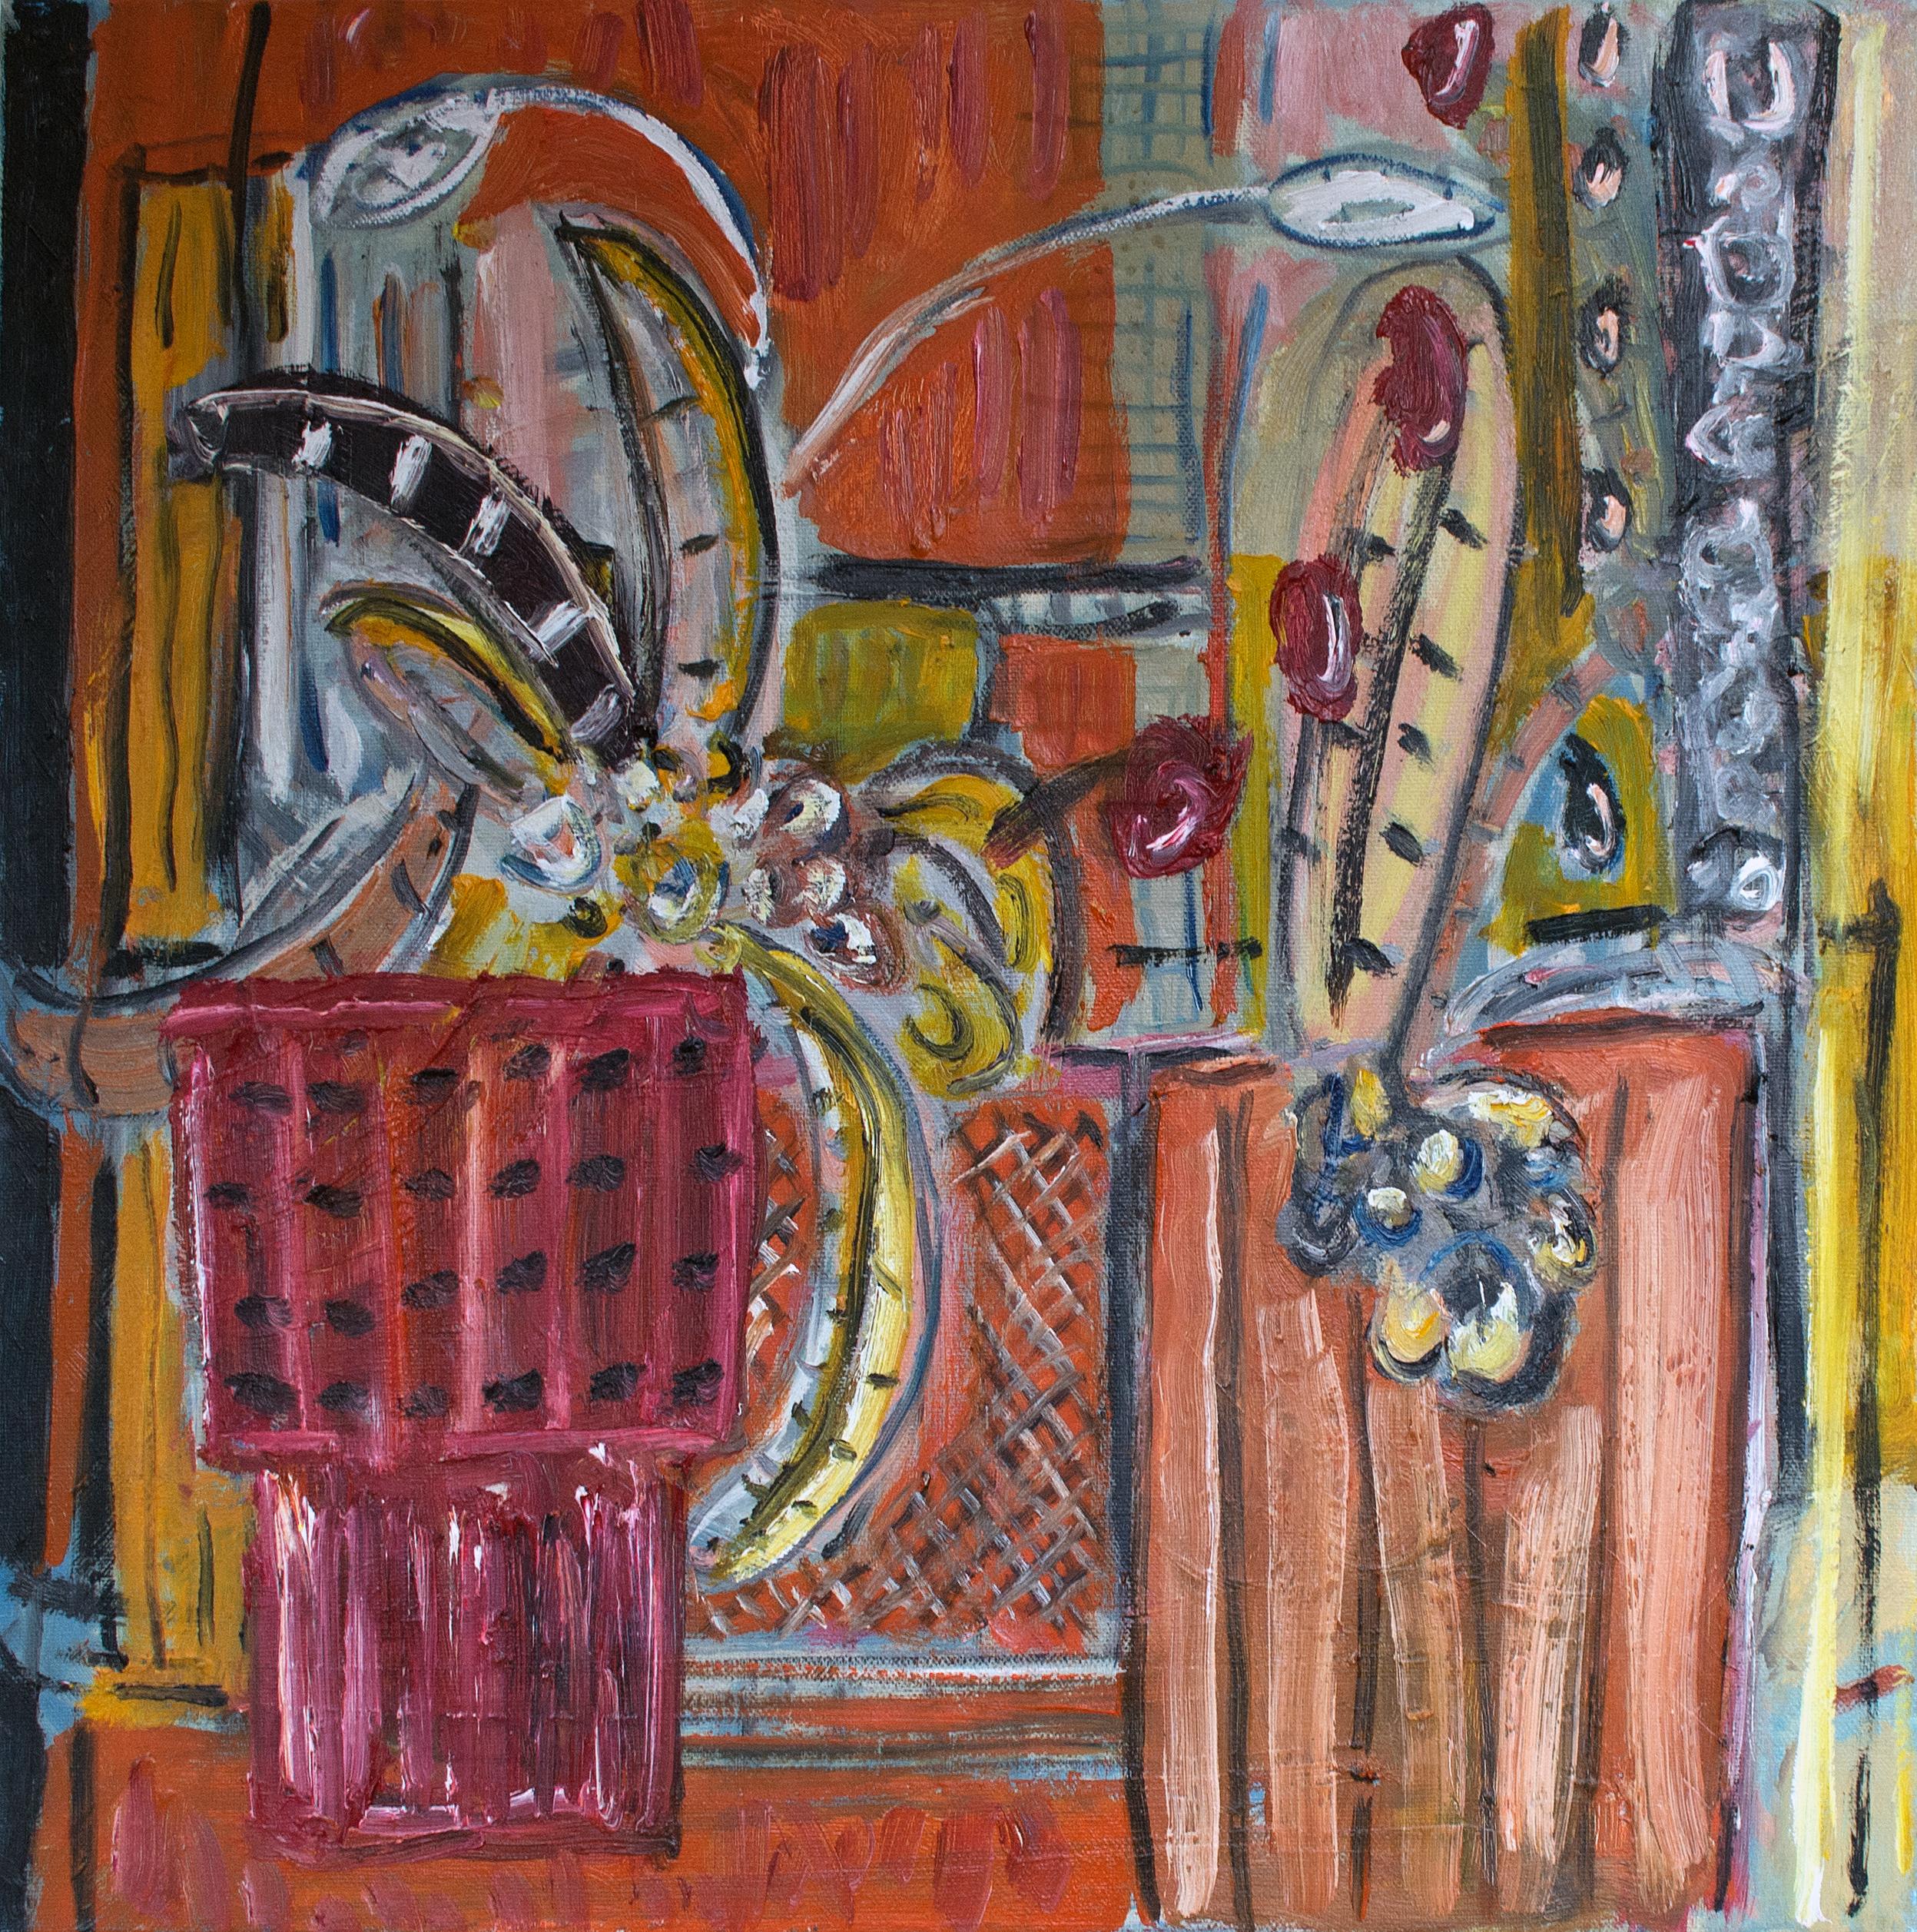 Alec Cumming, Big Snapper, oil on canvas, 50x49.5cm, 2015.jpg